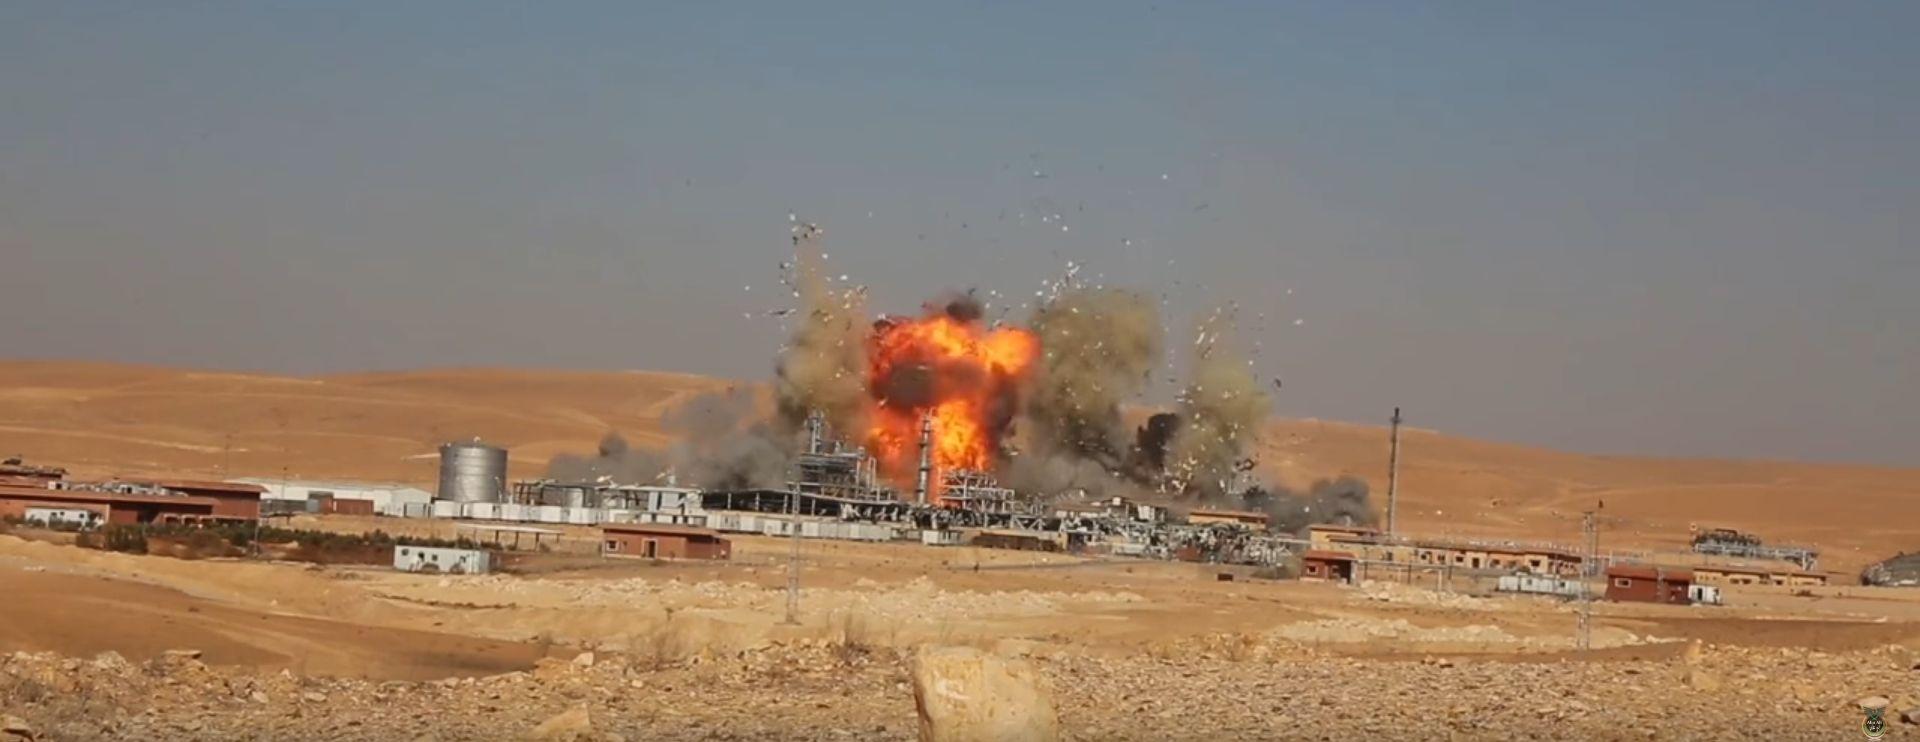 VIDEO: HAYAN Teroristi Islamske države digli u zrak INA-ino postrojenje u Siriji?